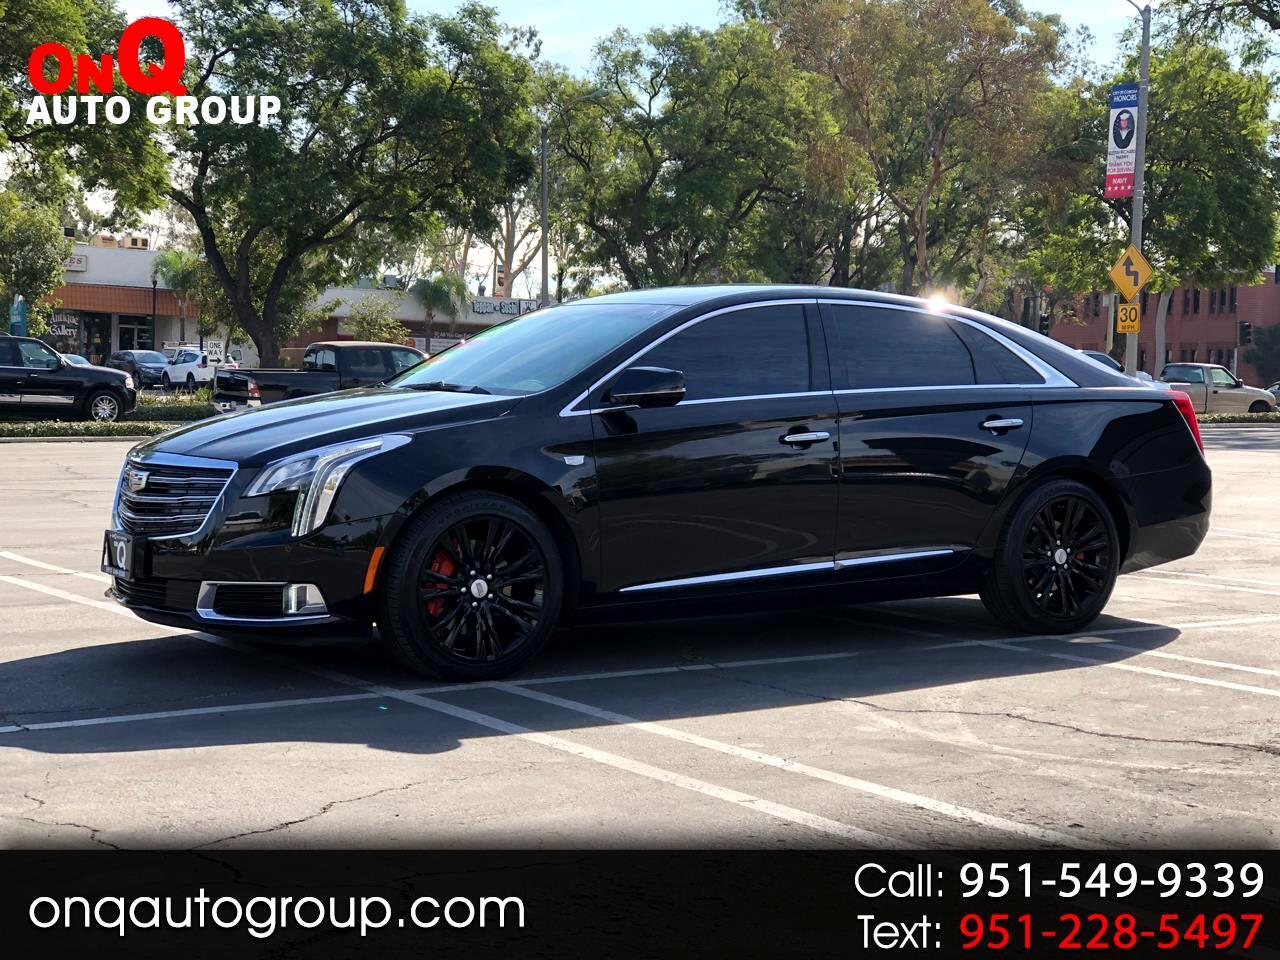 2018 Cadillac XTS 4dr Sdn Luxury FWD